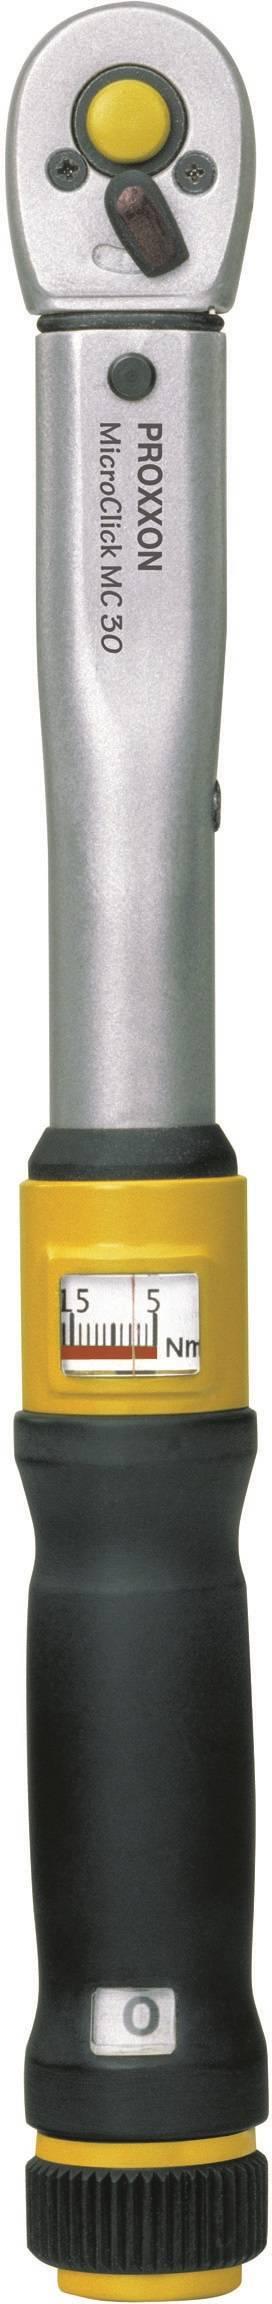 Momentový kľúč Proxxon Industrial 23349, 6 - 30 Nm